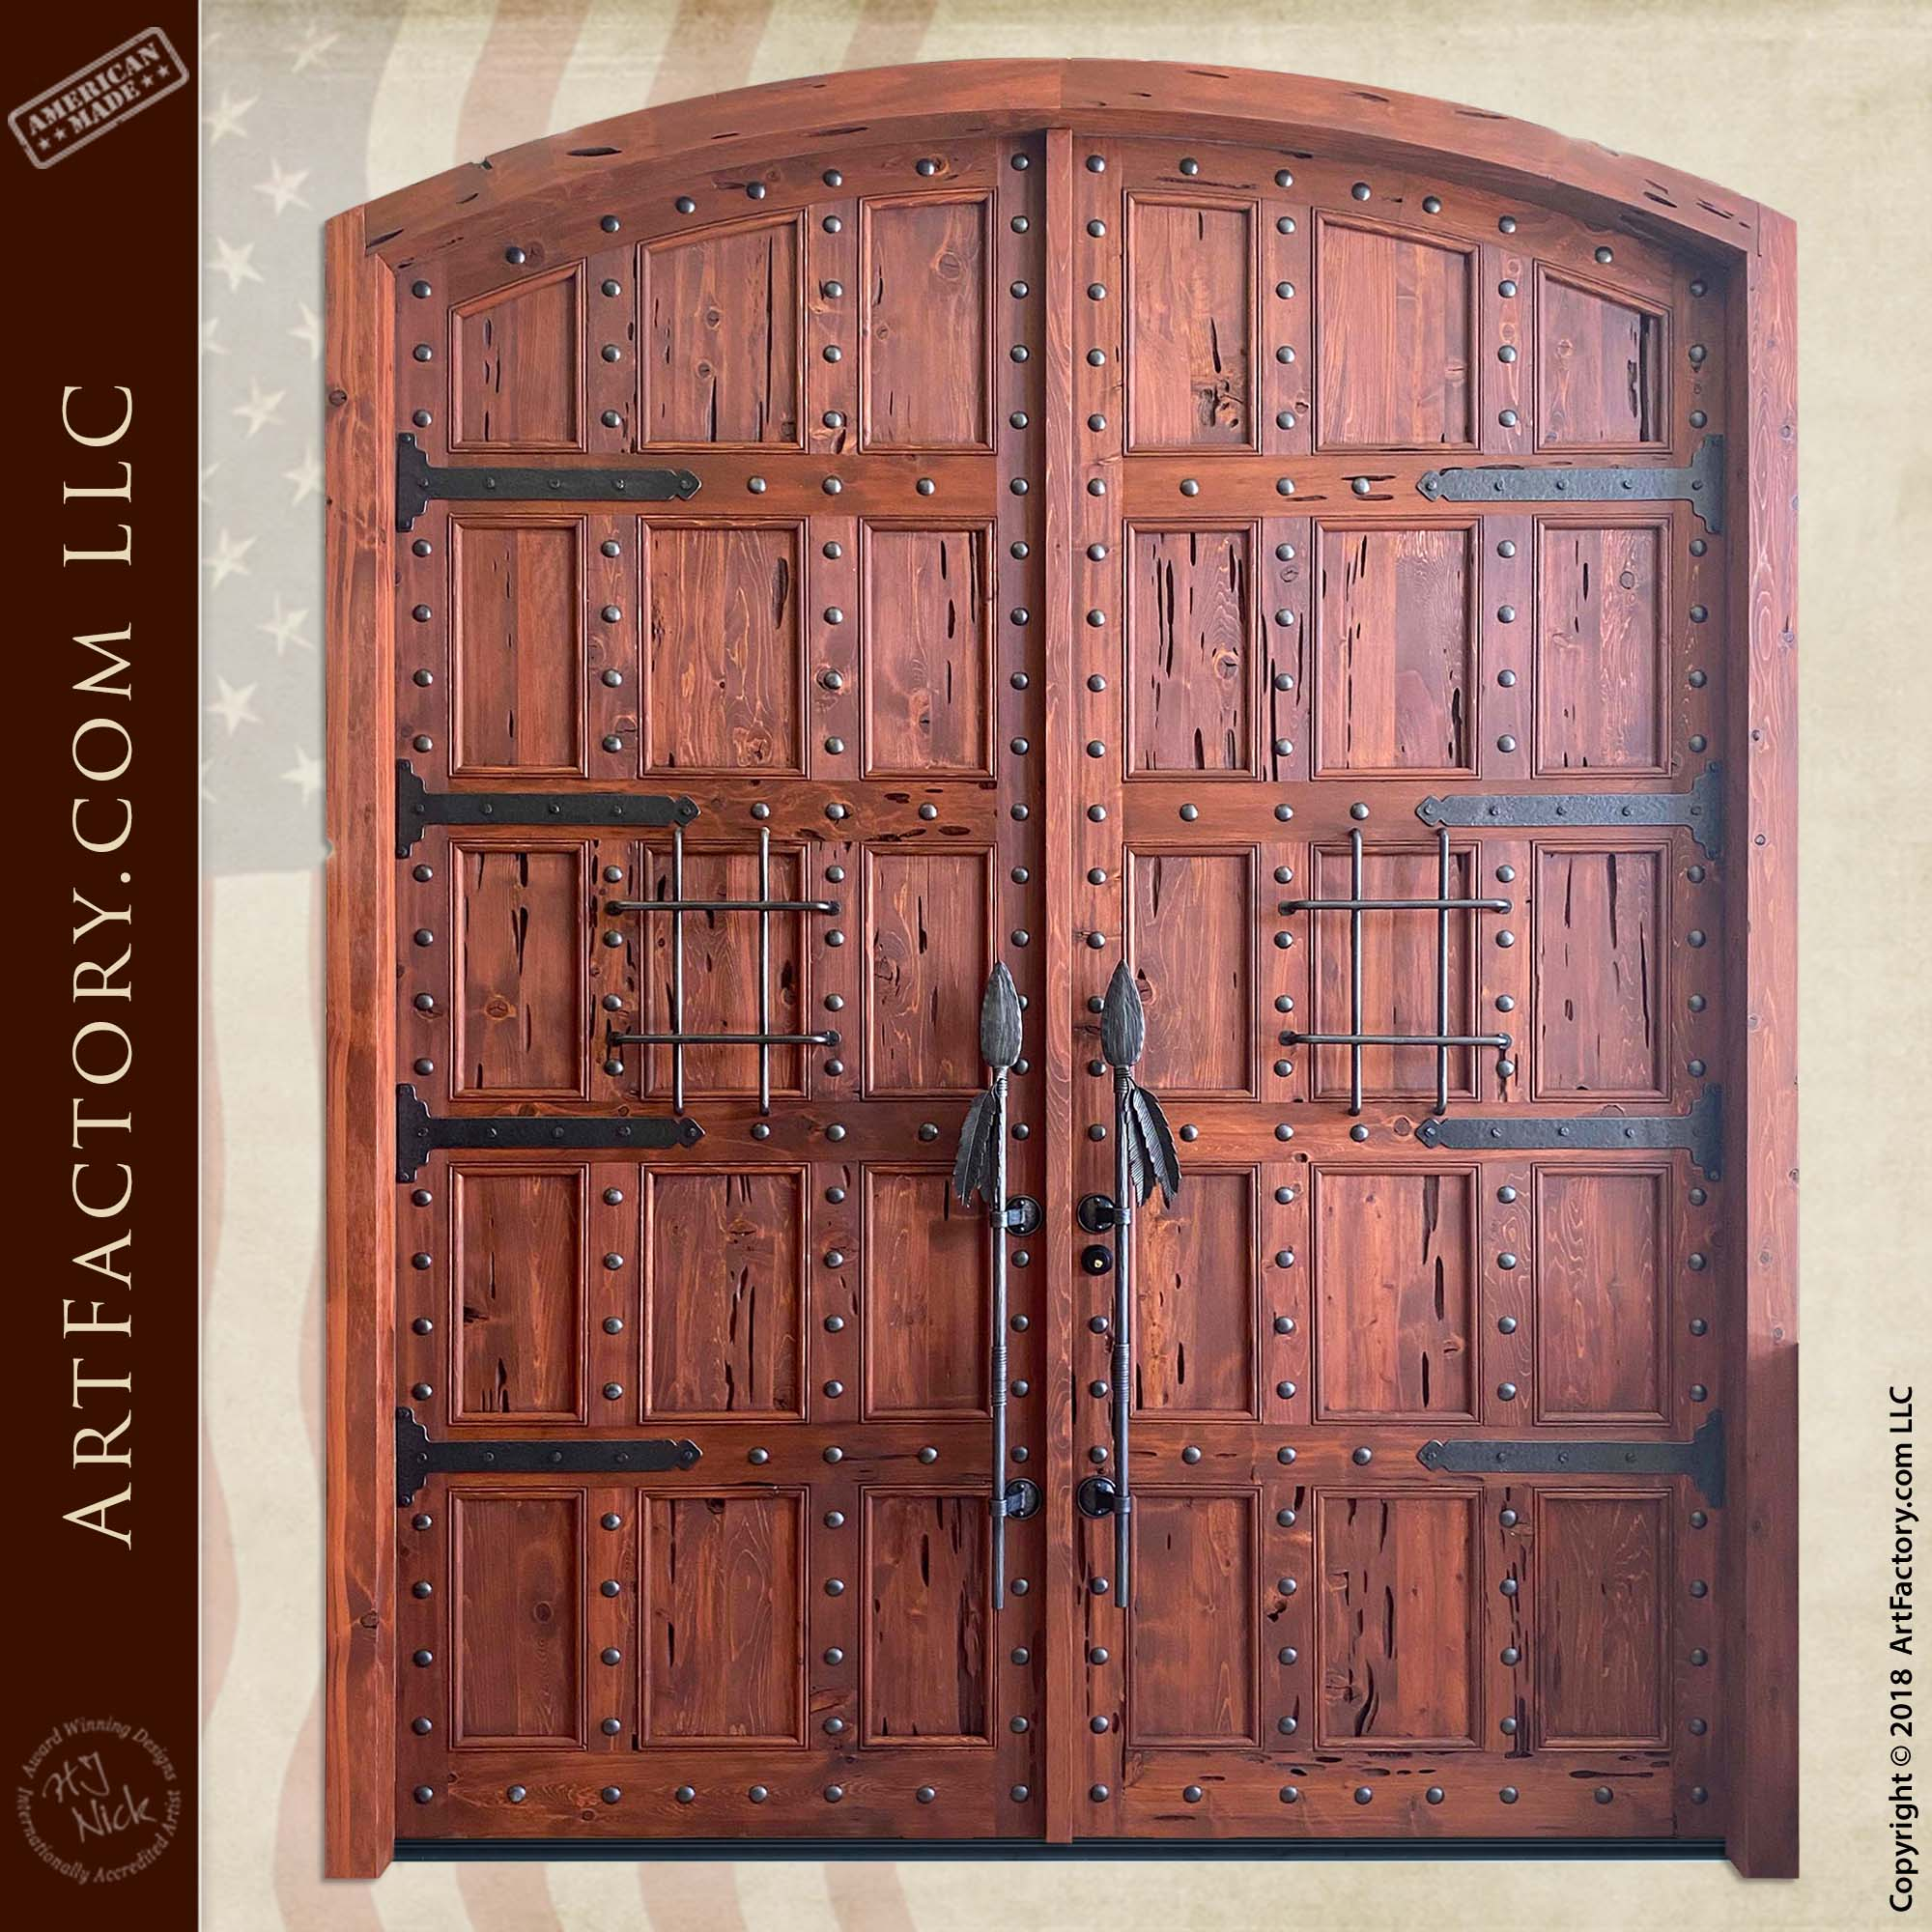 Custom Lodge Entrance Doors: Hand-Forged Iron Spear Door Pulls